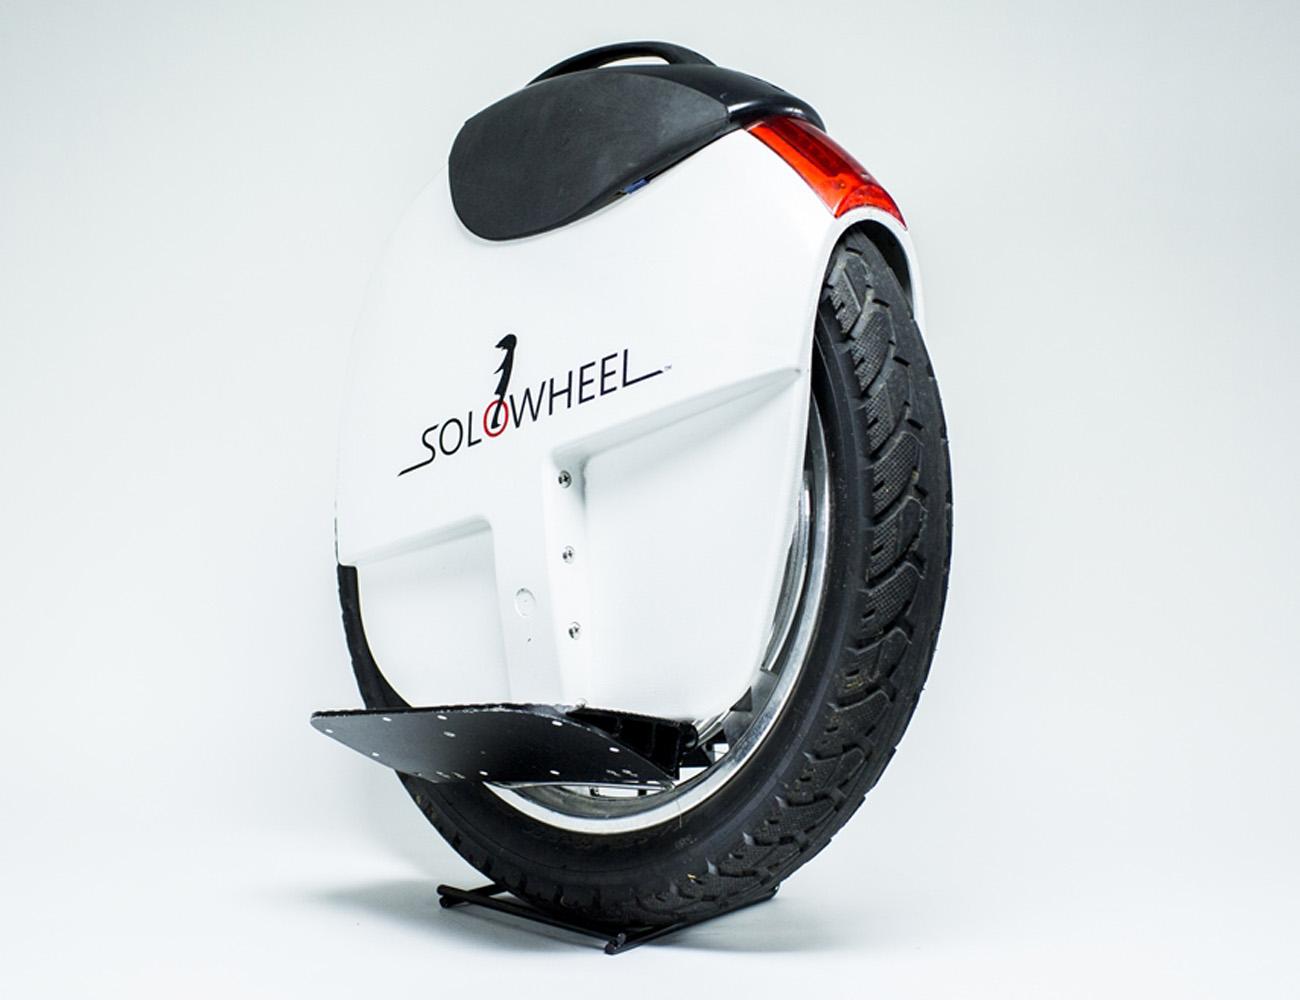 solowheel-xtreme-electric-unicycle-07